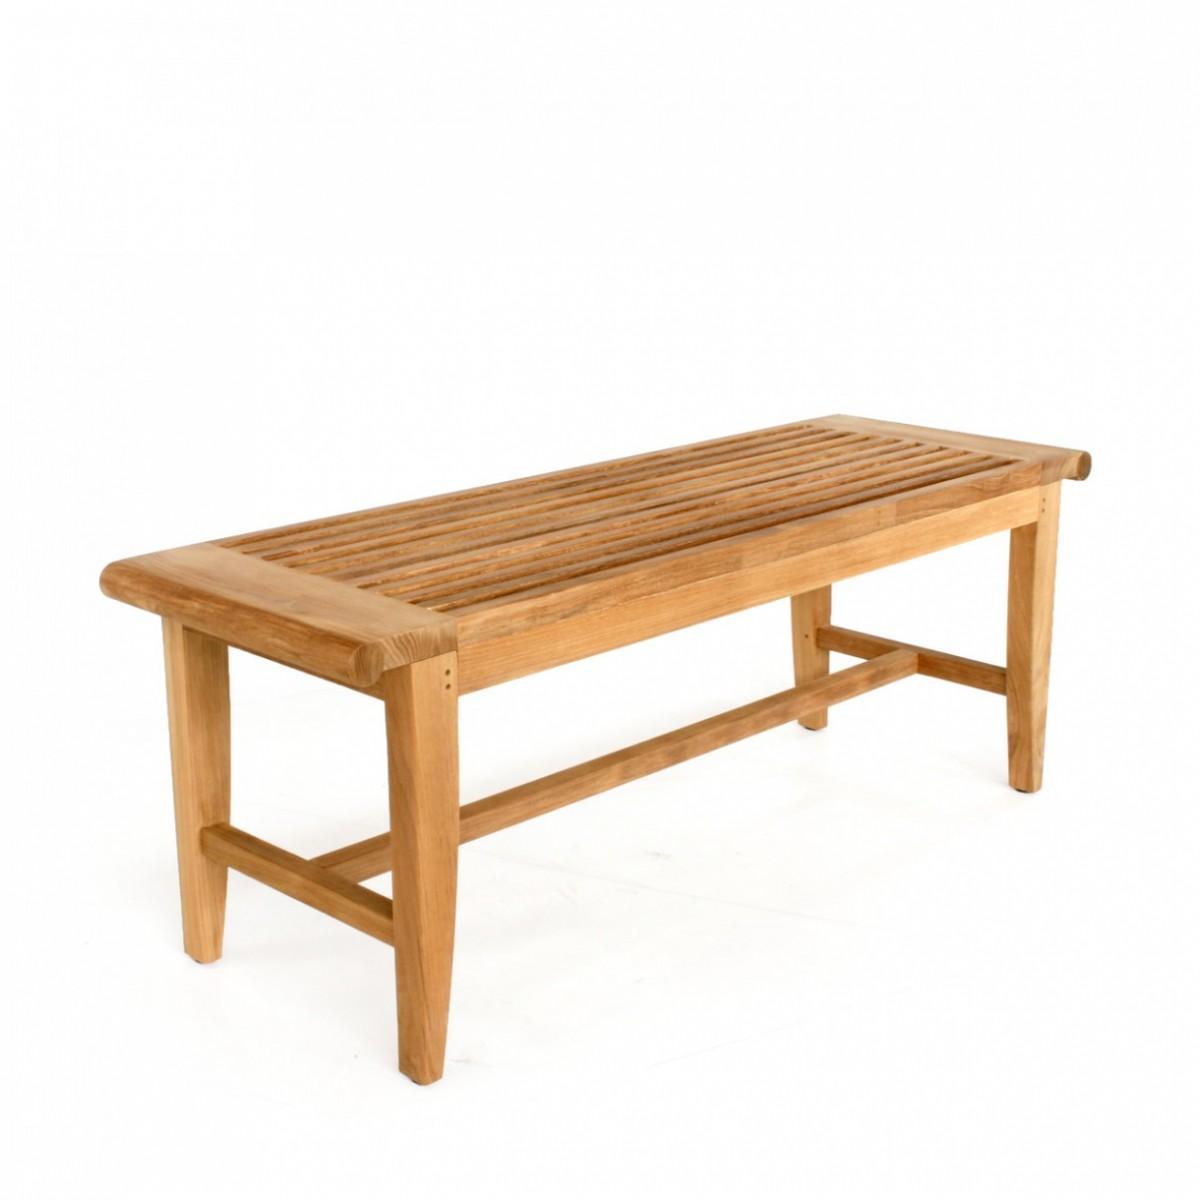 4ft Teak Wood Benches Westminster Teak Furniture